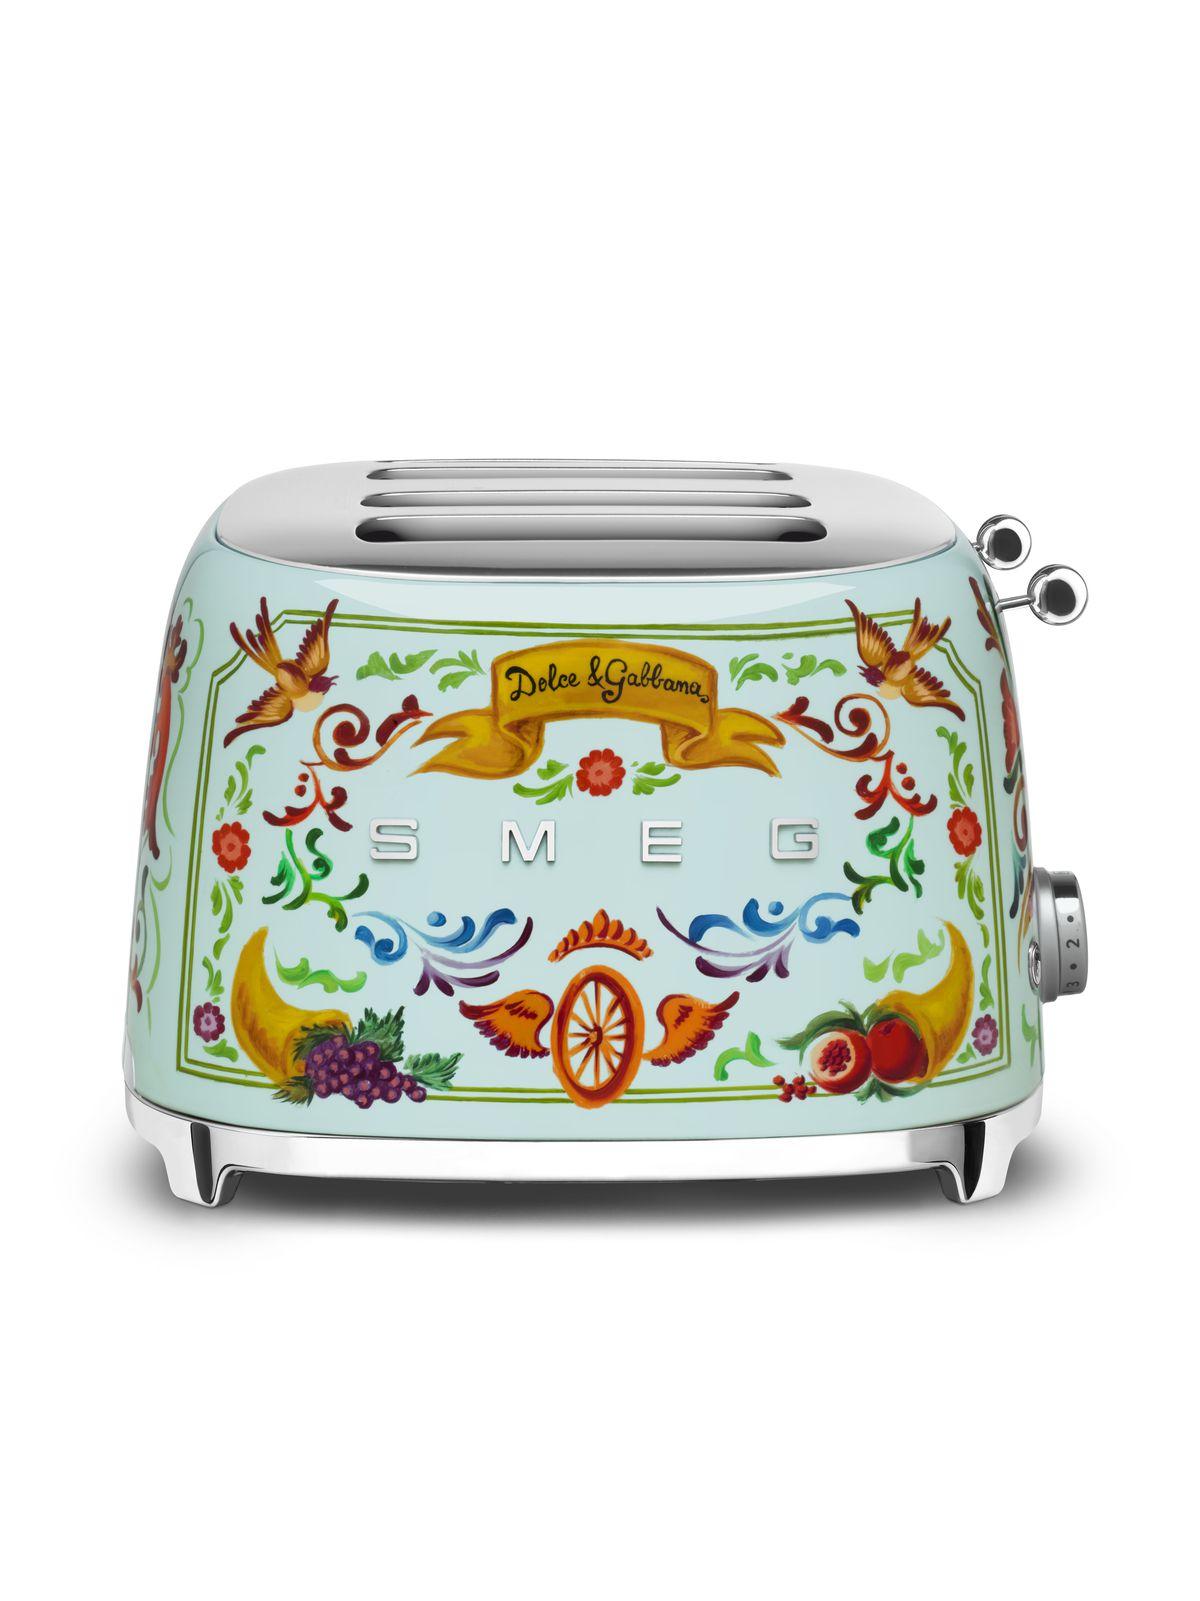 c9cd75b743e Dolce   Gabbana for Smeg kitchen appliances expands again - Curbed